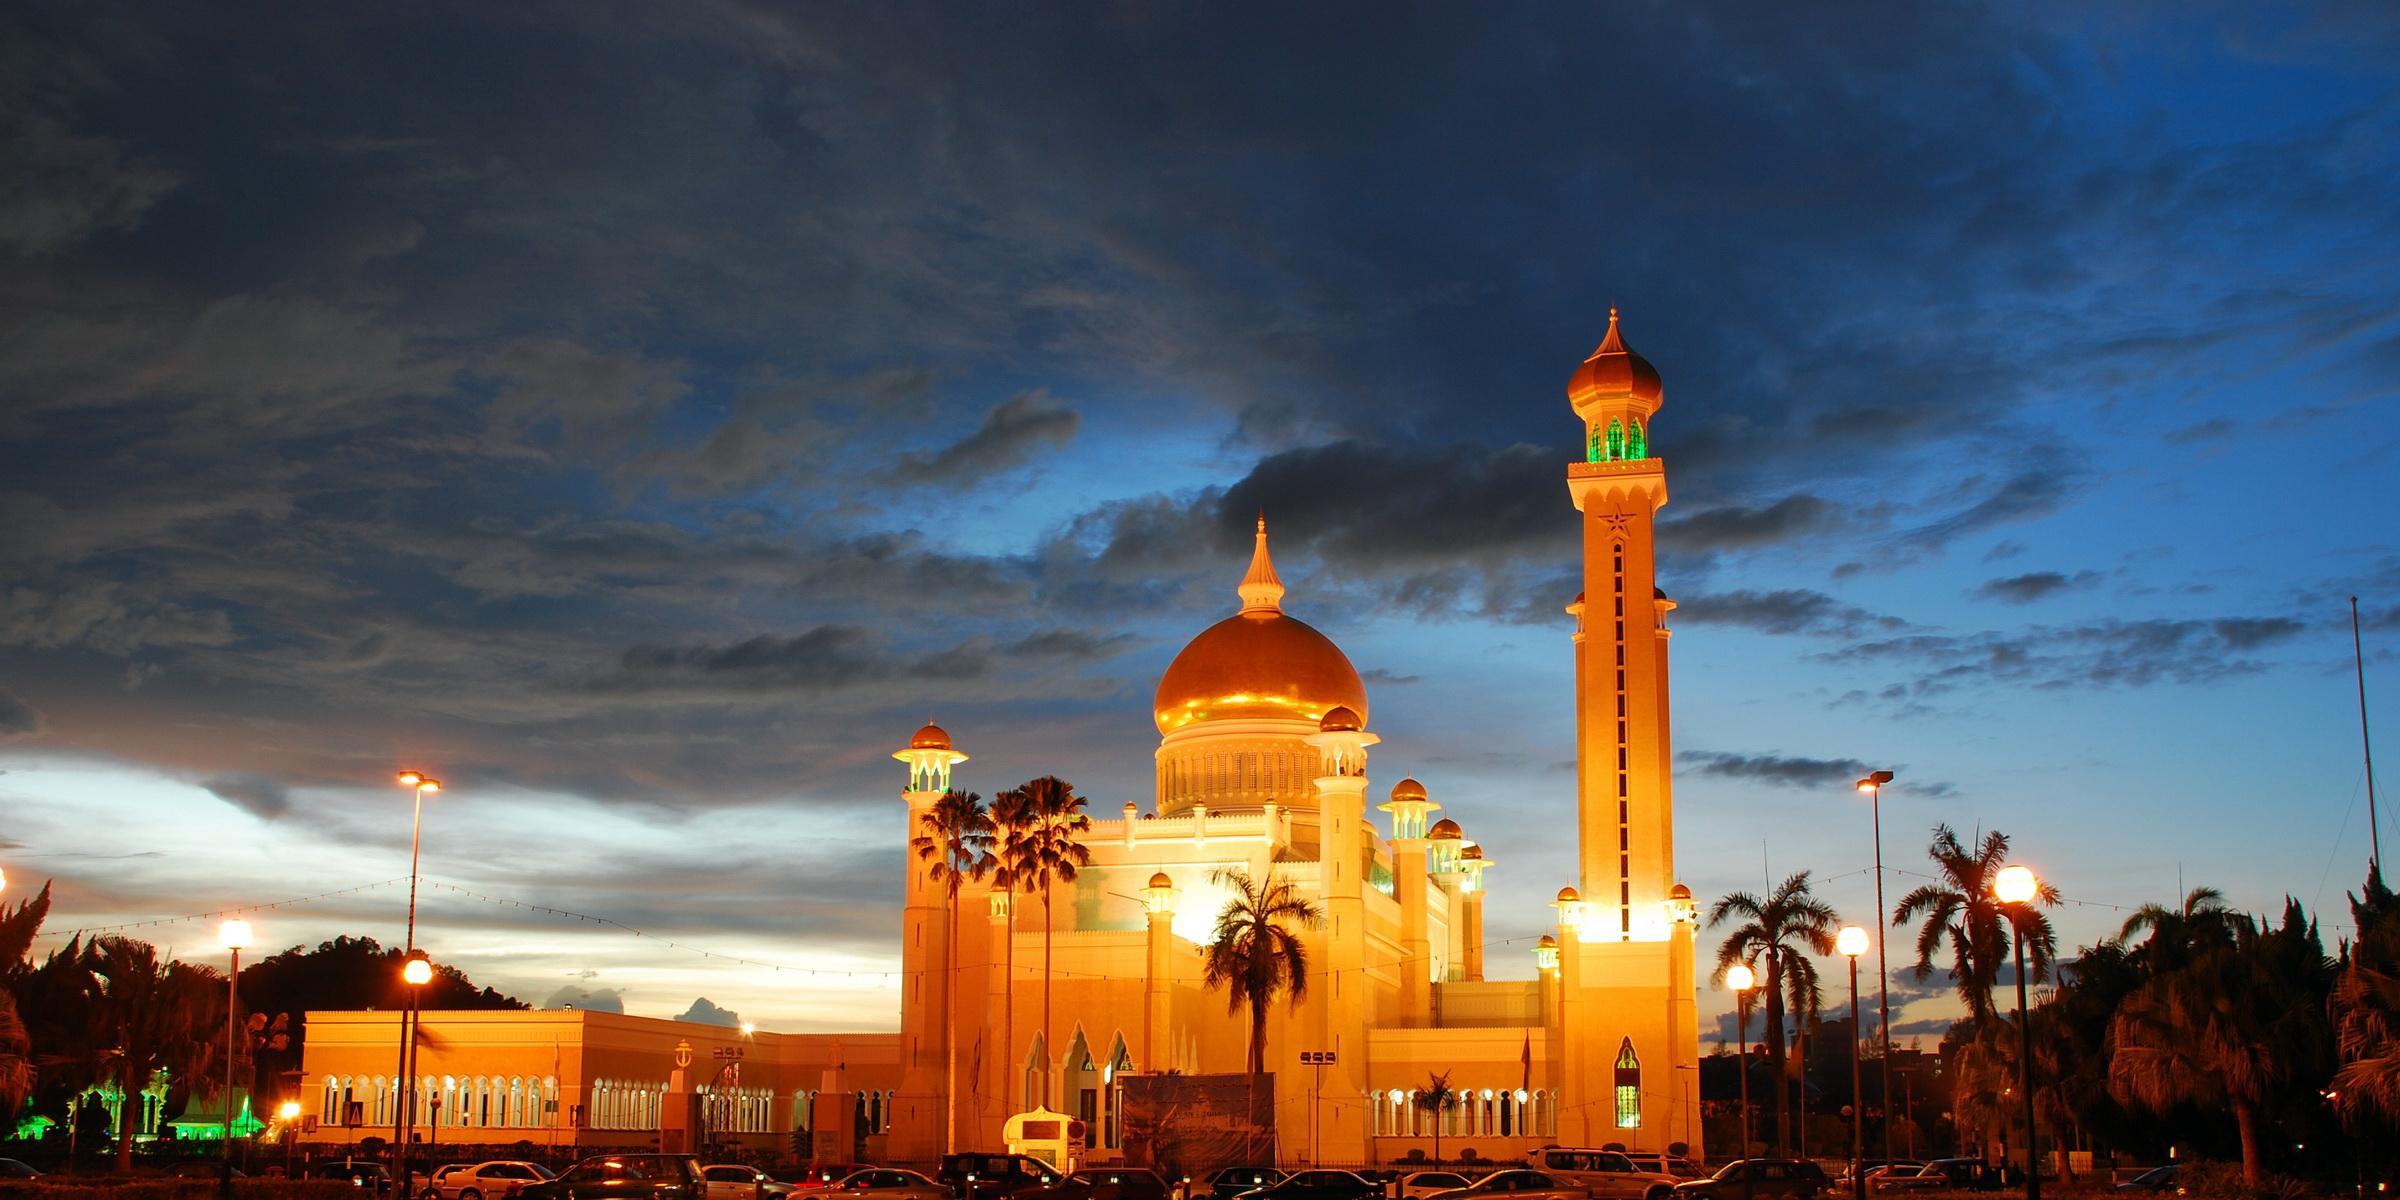 78 Wallpaper Of Masjid On Wallpapersafari